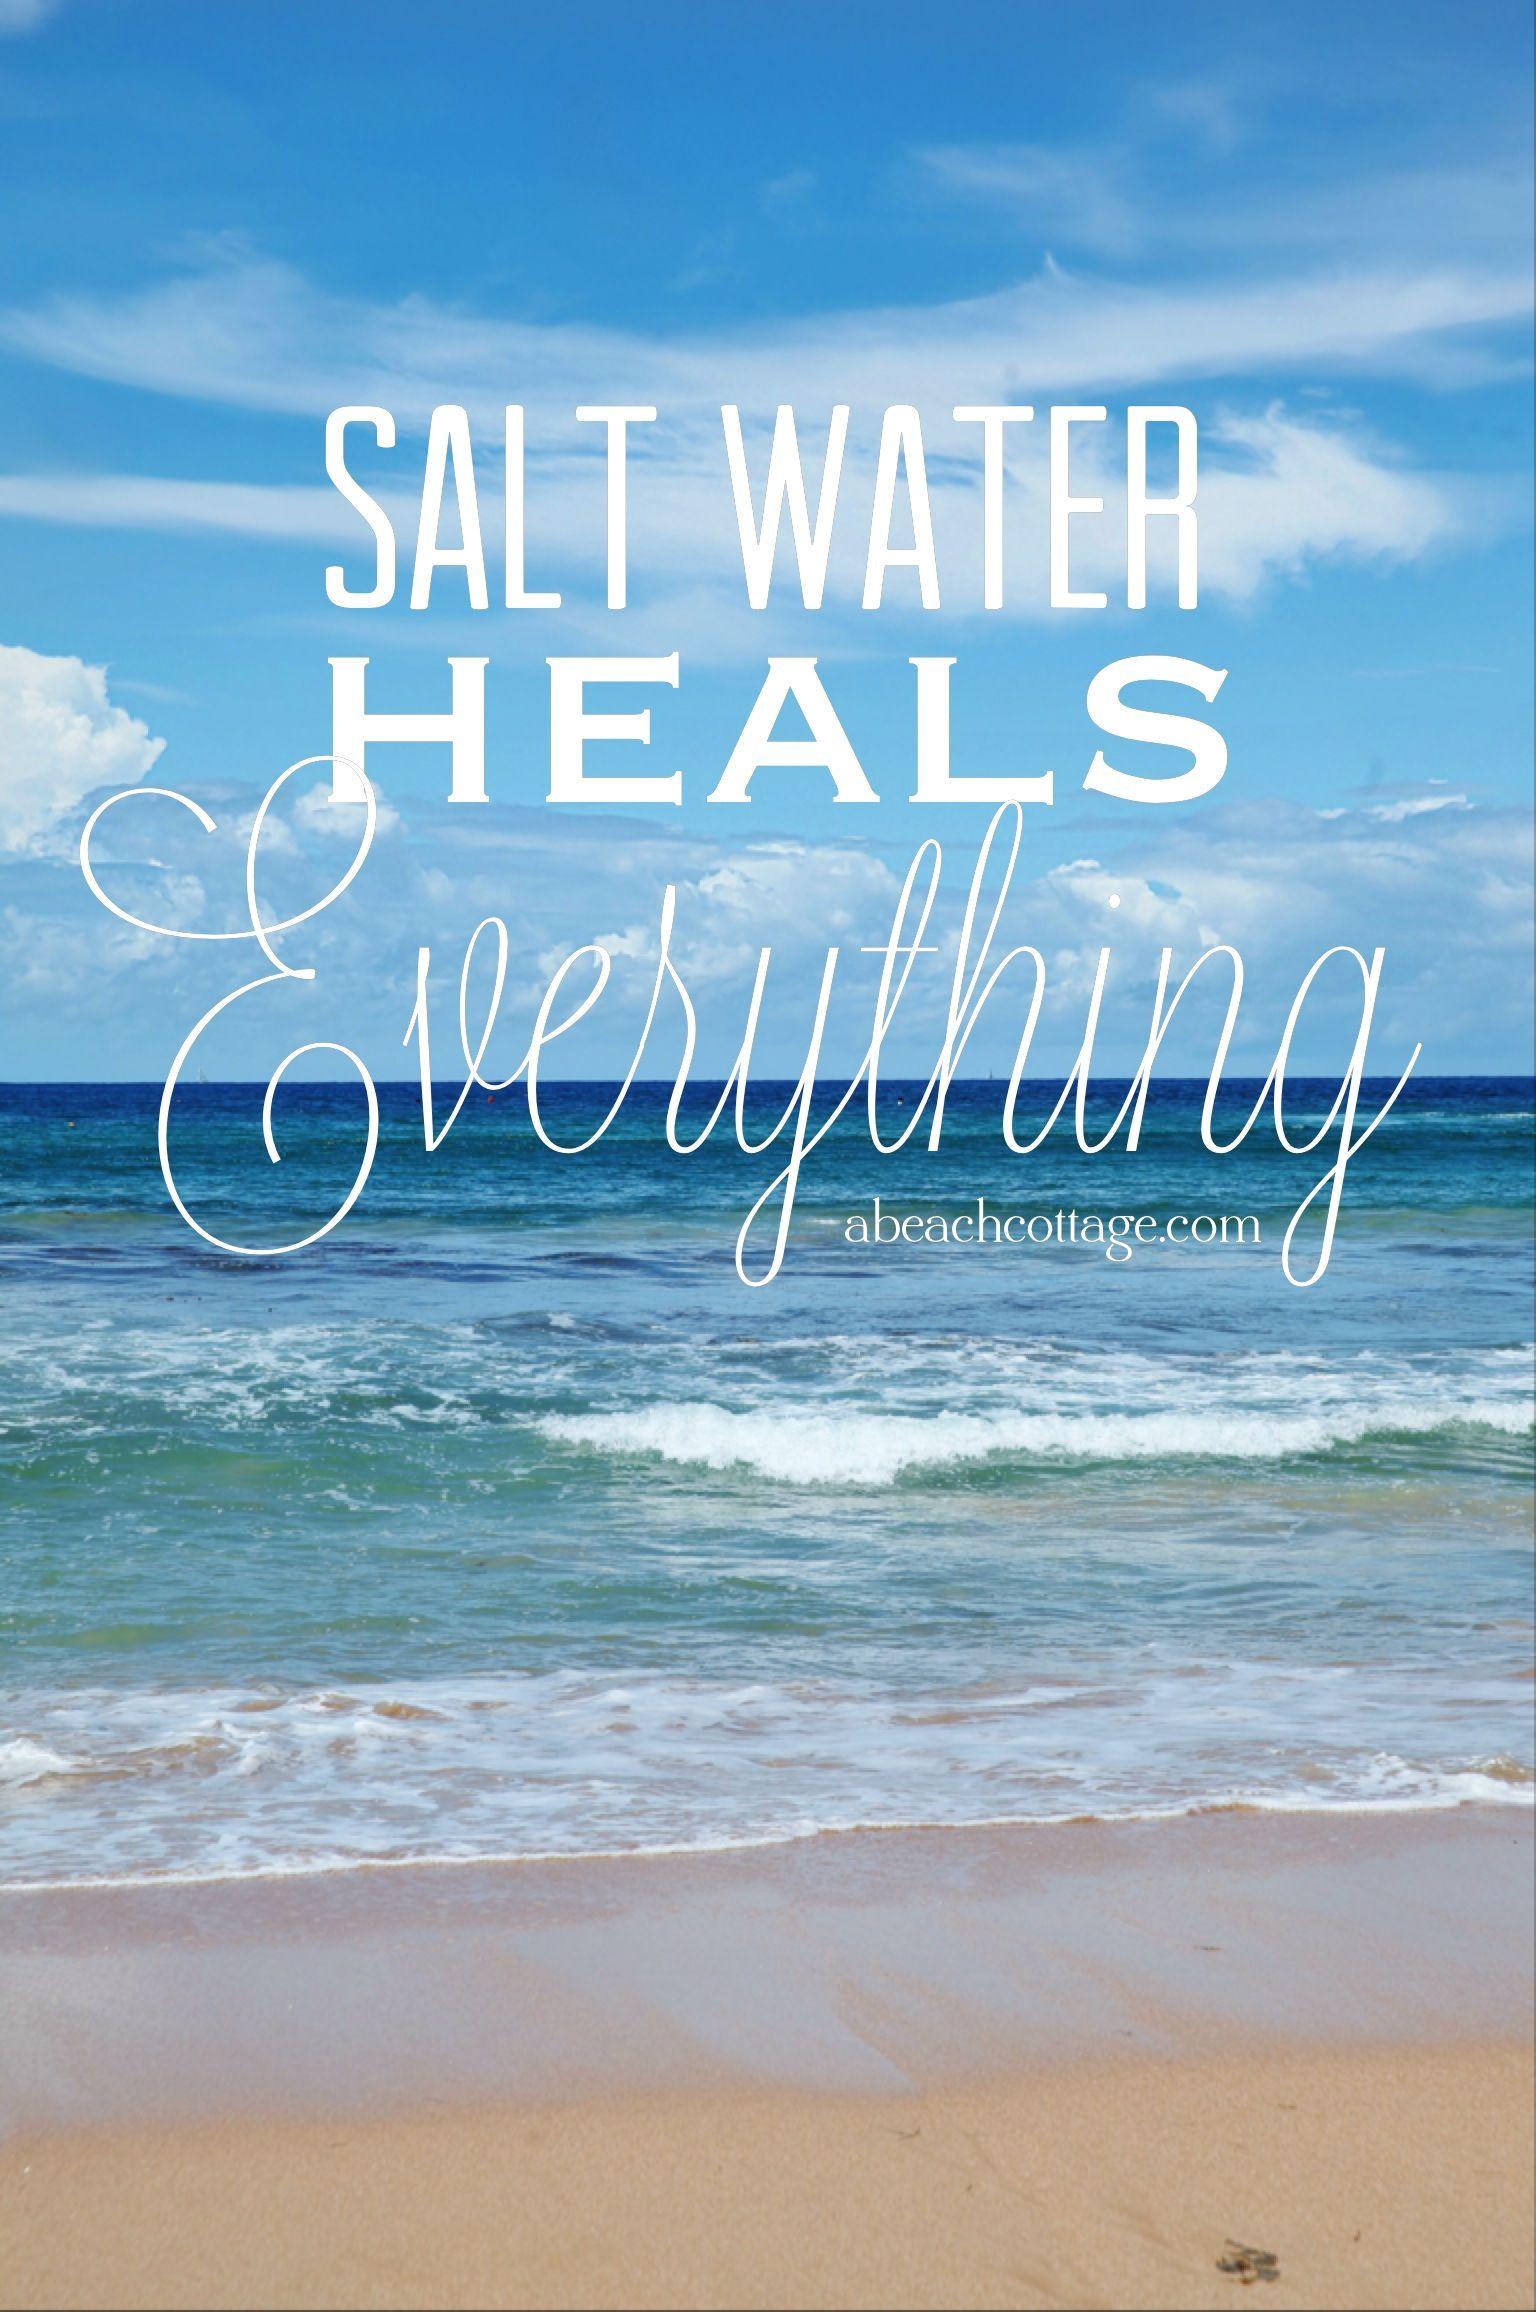 Beach Quotes On Pinterest  Ocean Quotes, Summer Beach